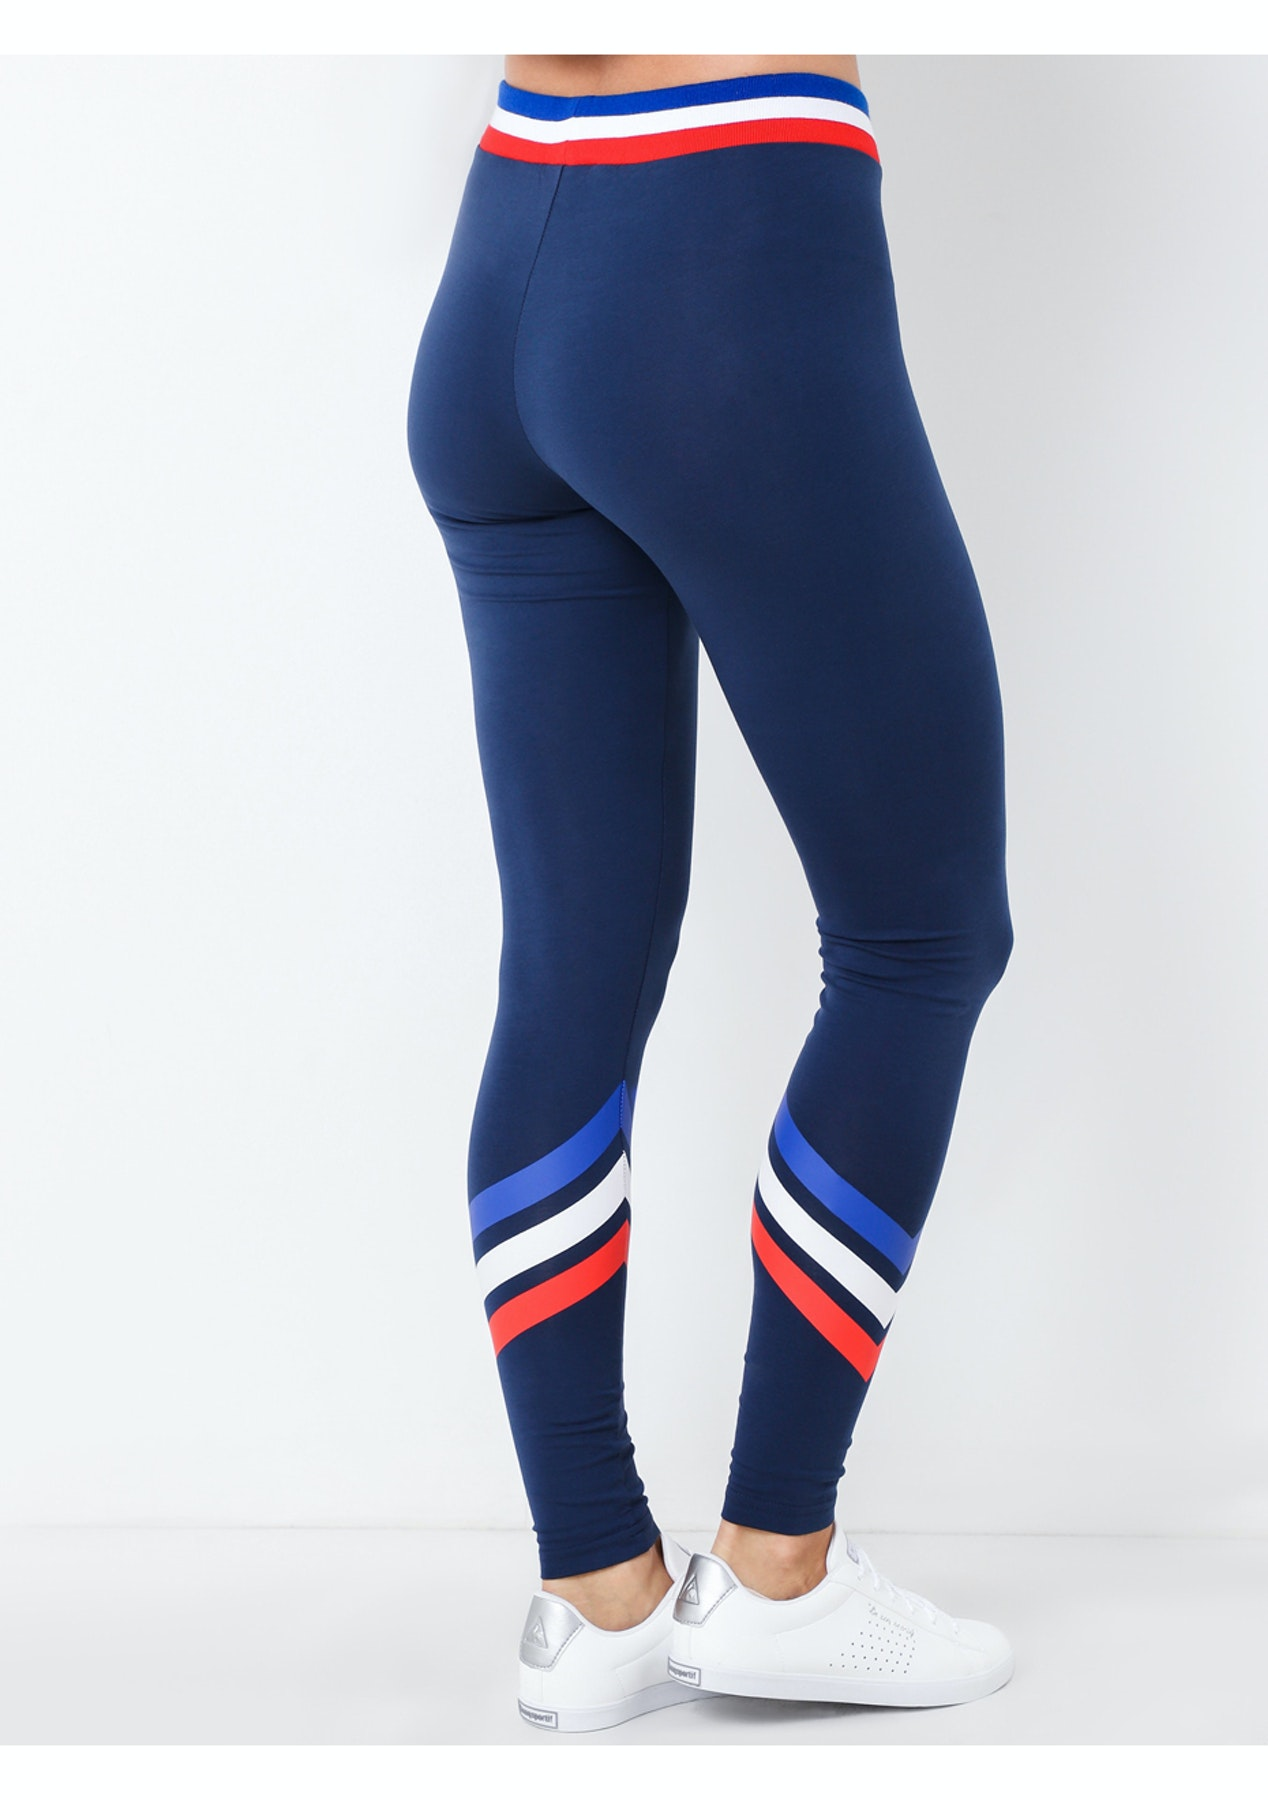 cbea634657f4 Le Coq Sportif - Womens Amie Legging - Dress Blues - The Streetwear Edit -  Onceit